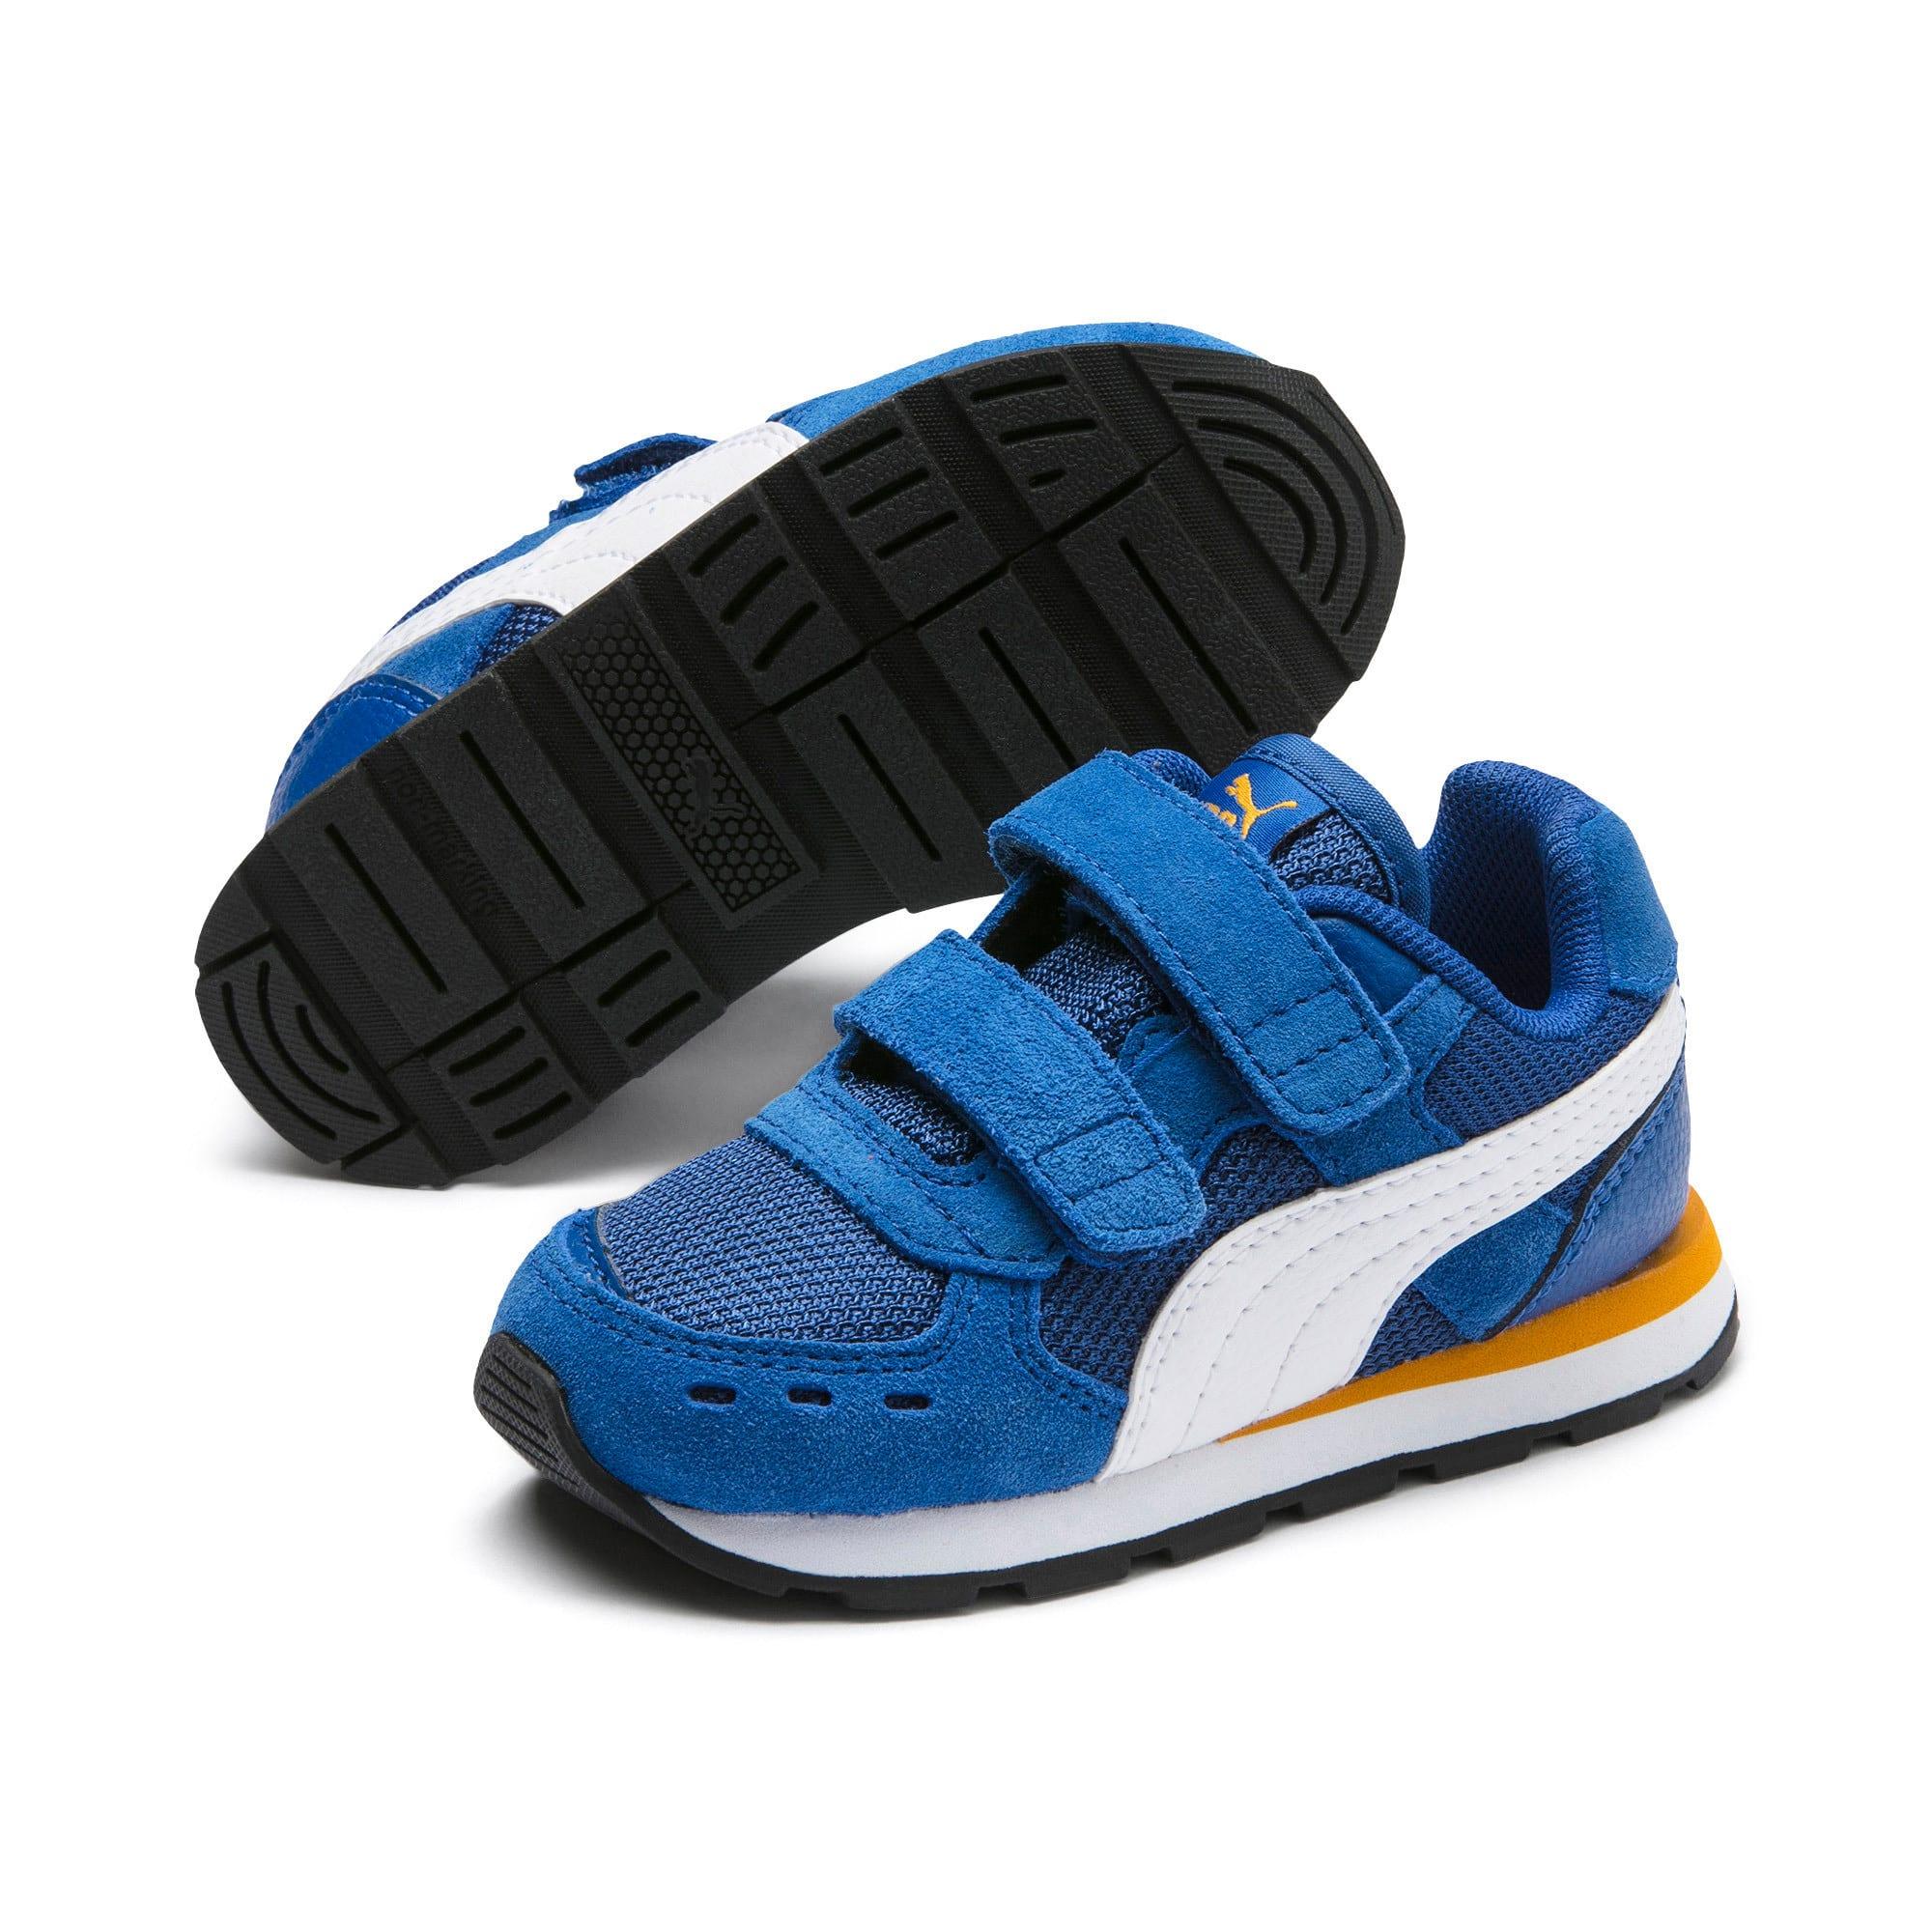 Thumbnail 2 of Vista Toddler Shoes, Galaxy Blue-Puma White, medium